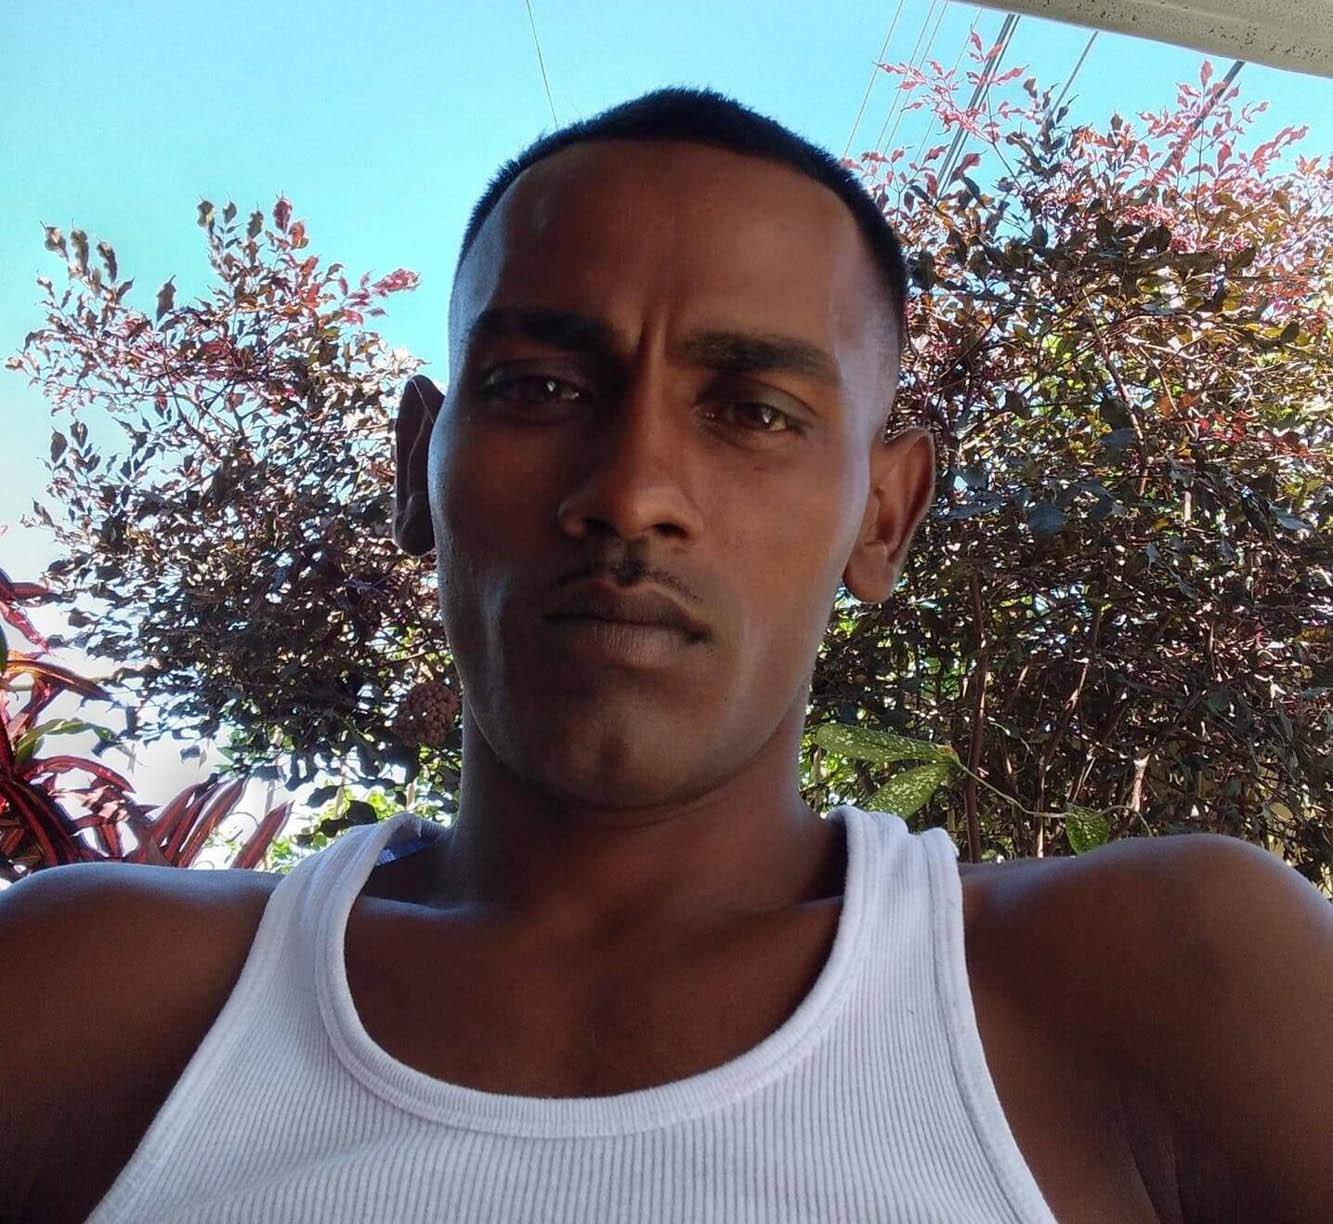 Trinidad: Man found dead in police station cell - Stabroek